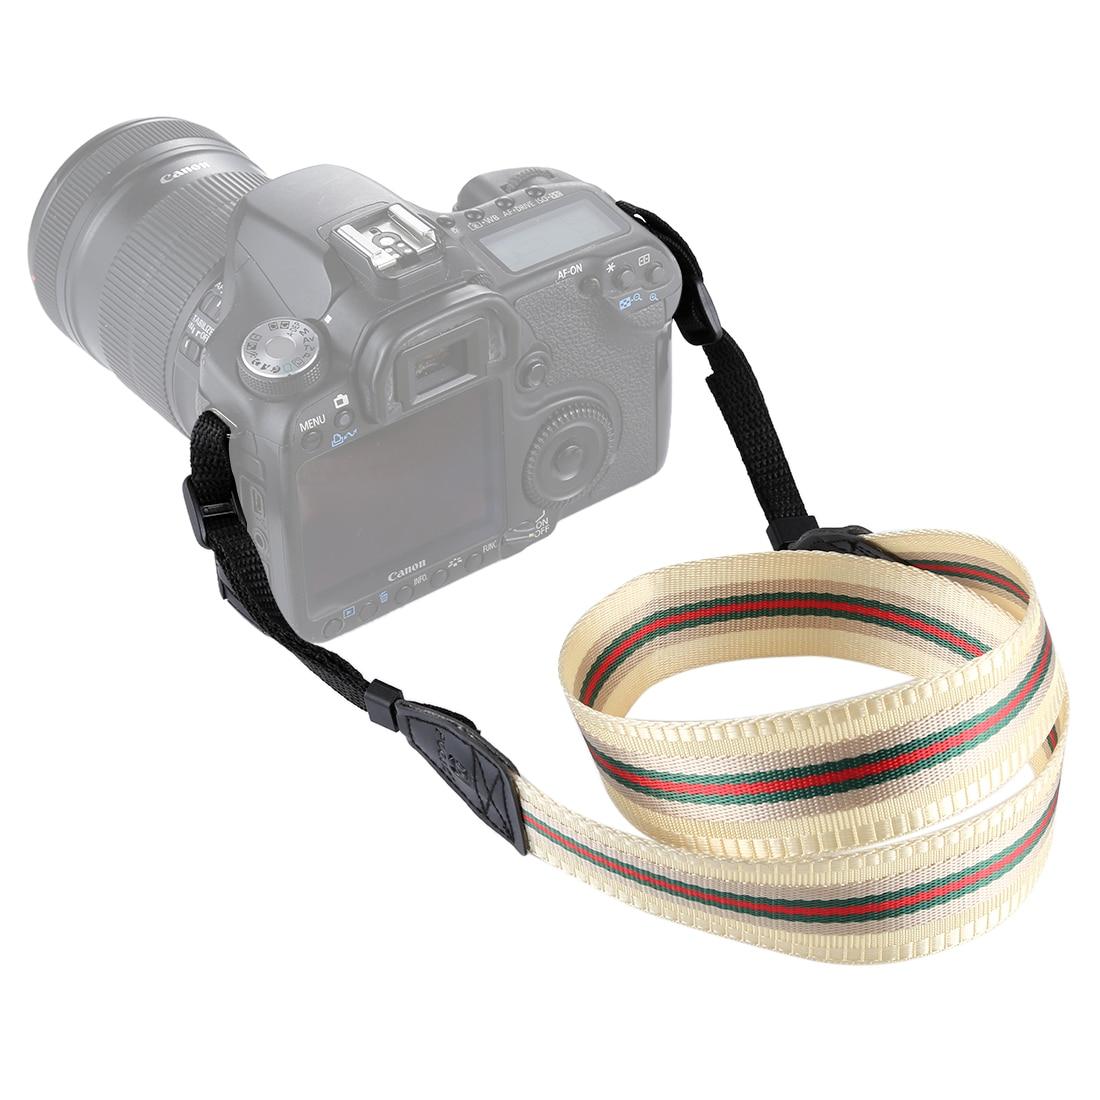 Ethnic Style Photo Camera Colorful Strap Cotton Yard Pattern Neck Strap DSLR Shoulder Hand Strap for Canon Nikon